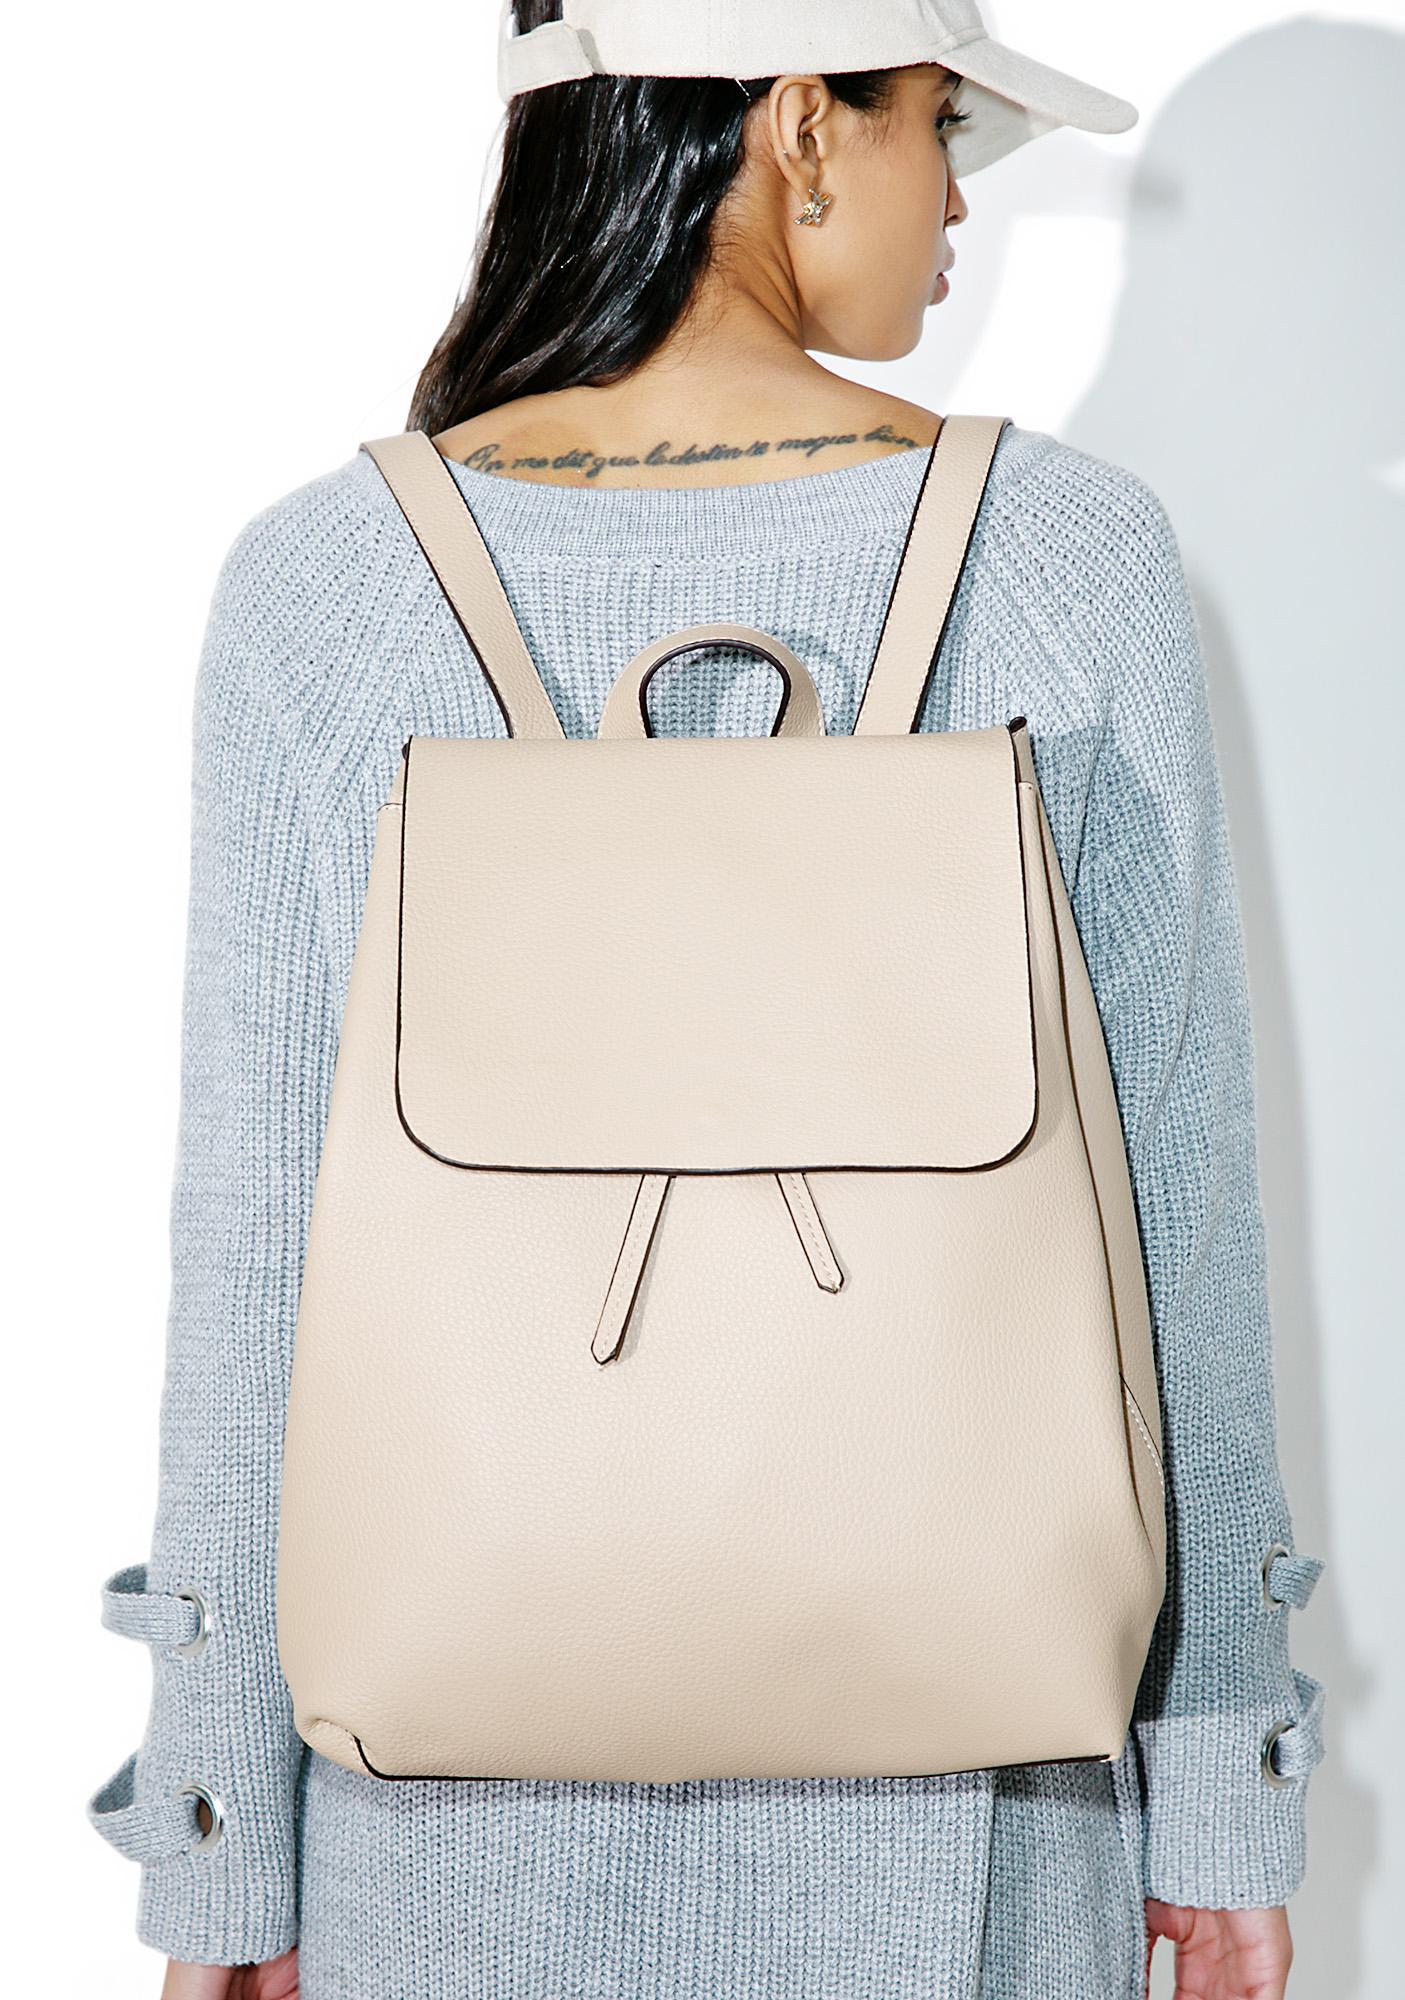 Architect Backpack